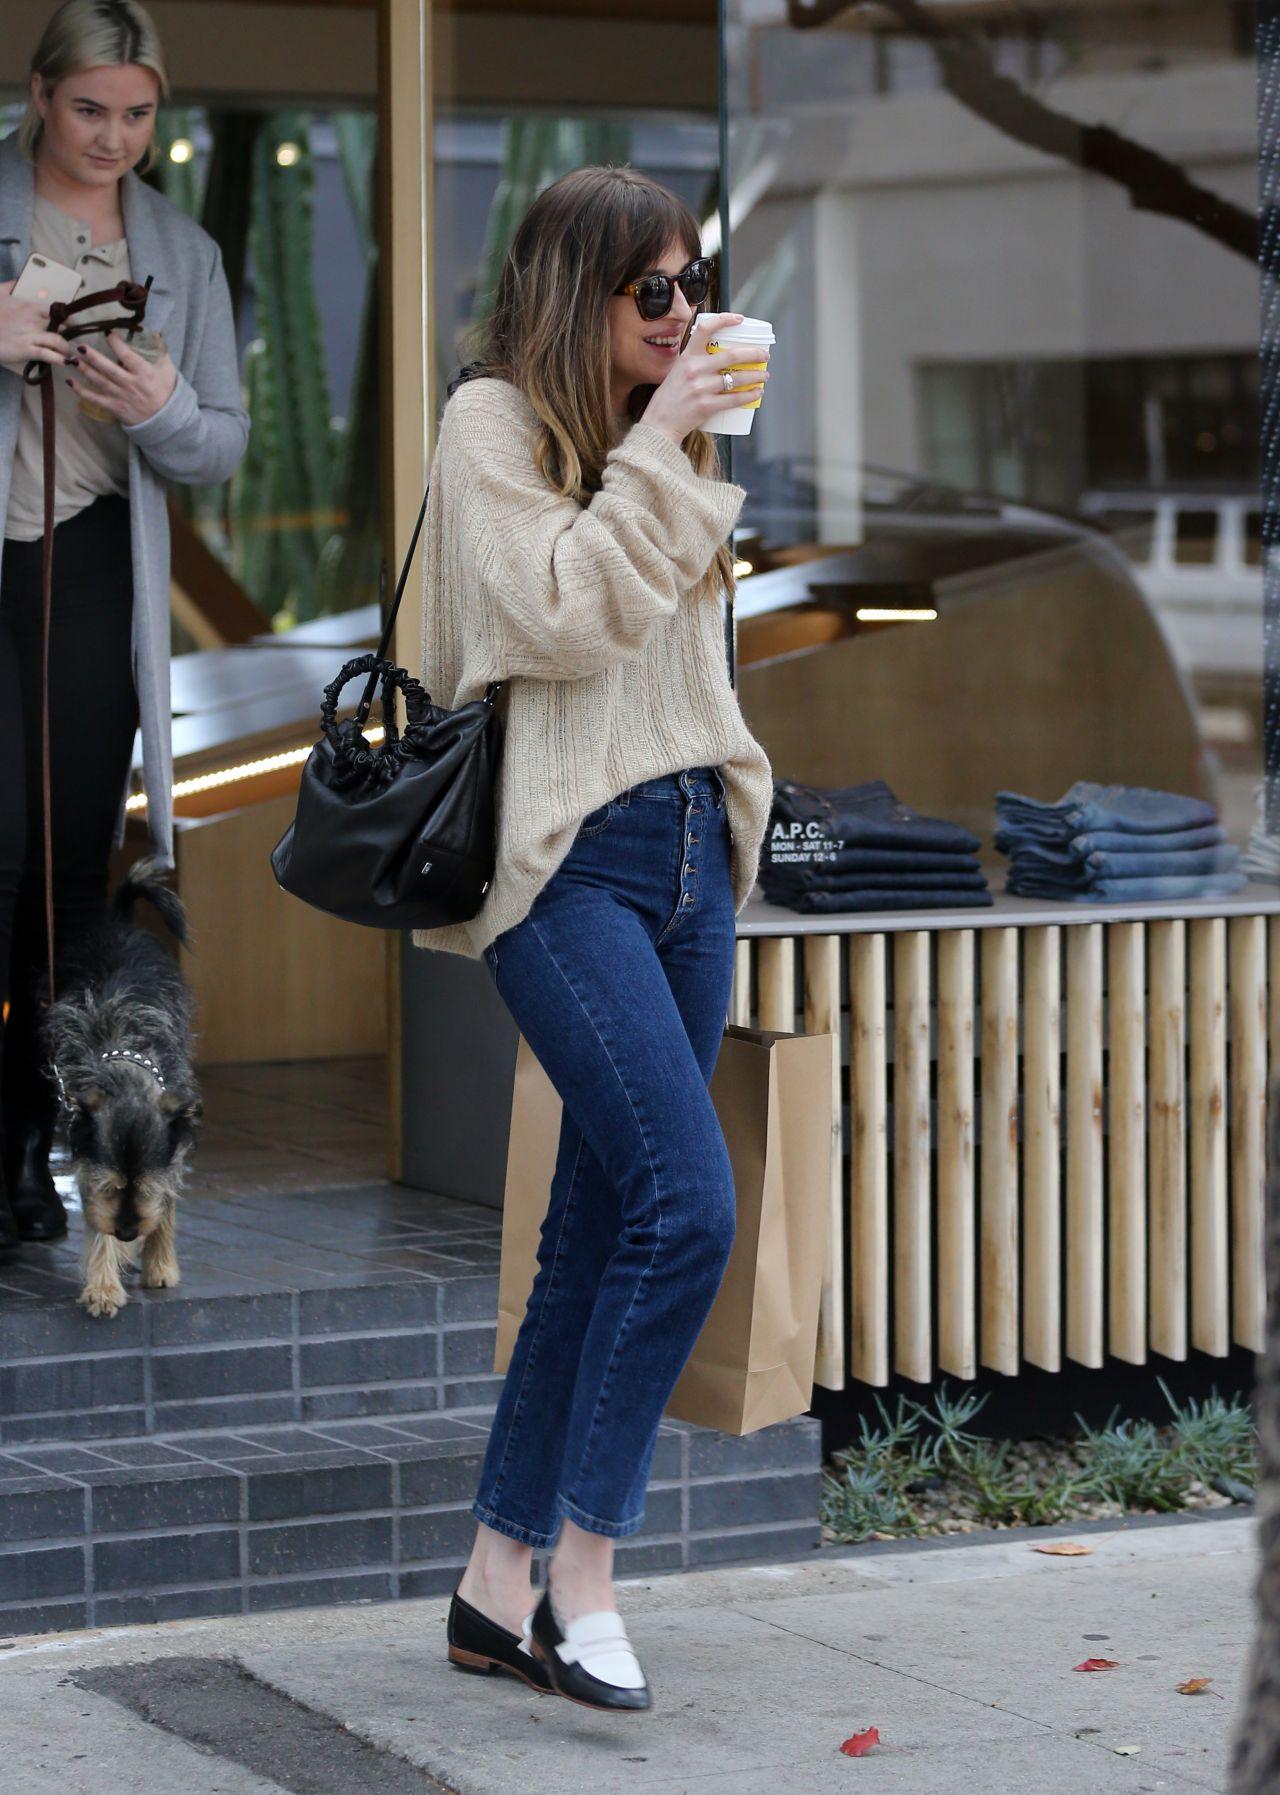 Dakota Johnson Shopping And Drinking Coffee In La 03 01 2018